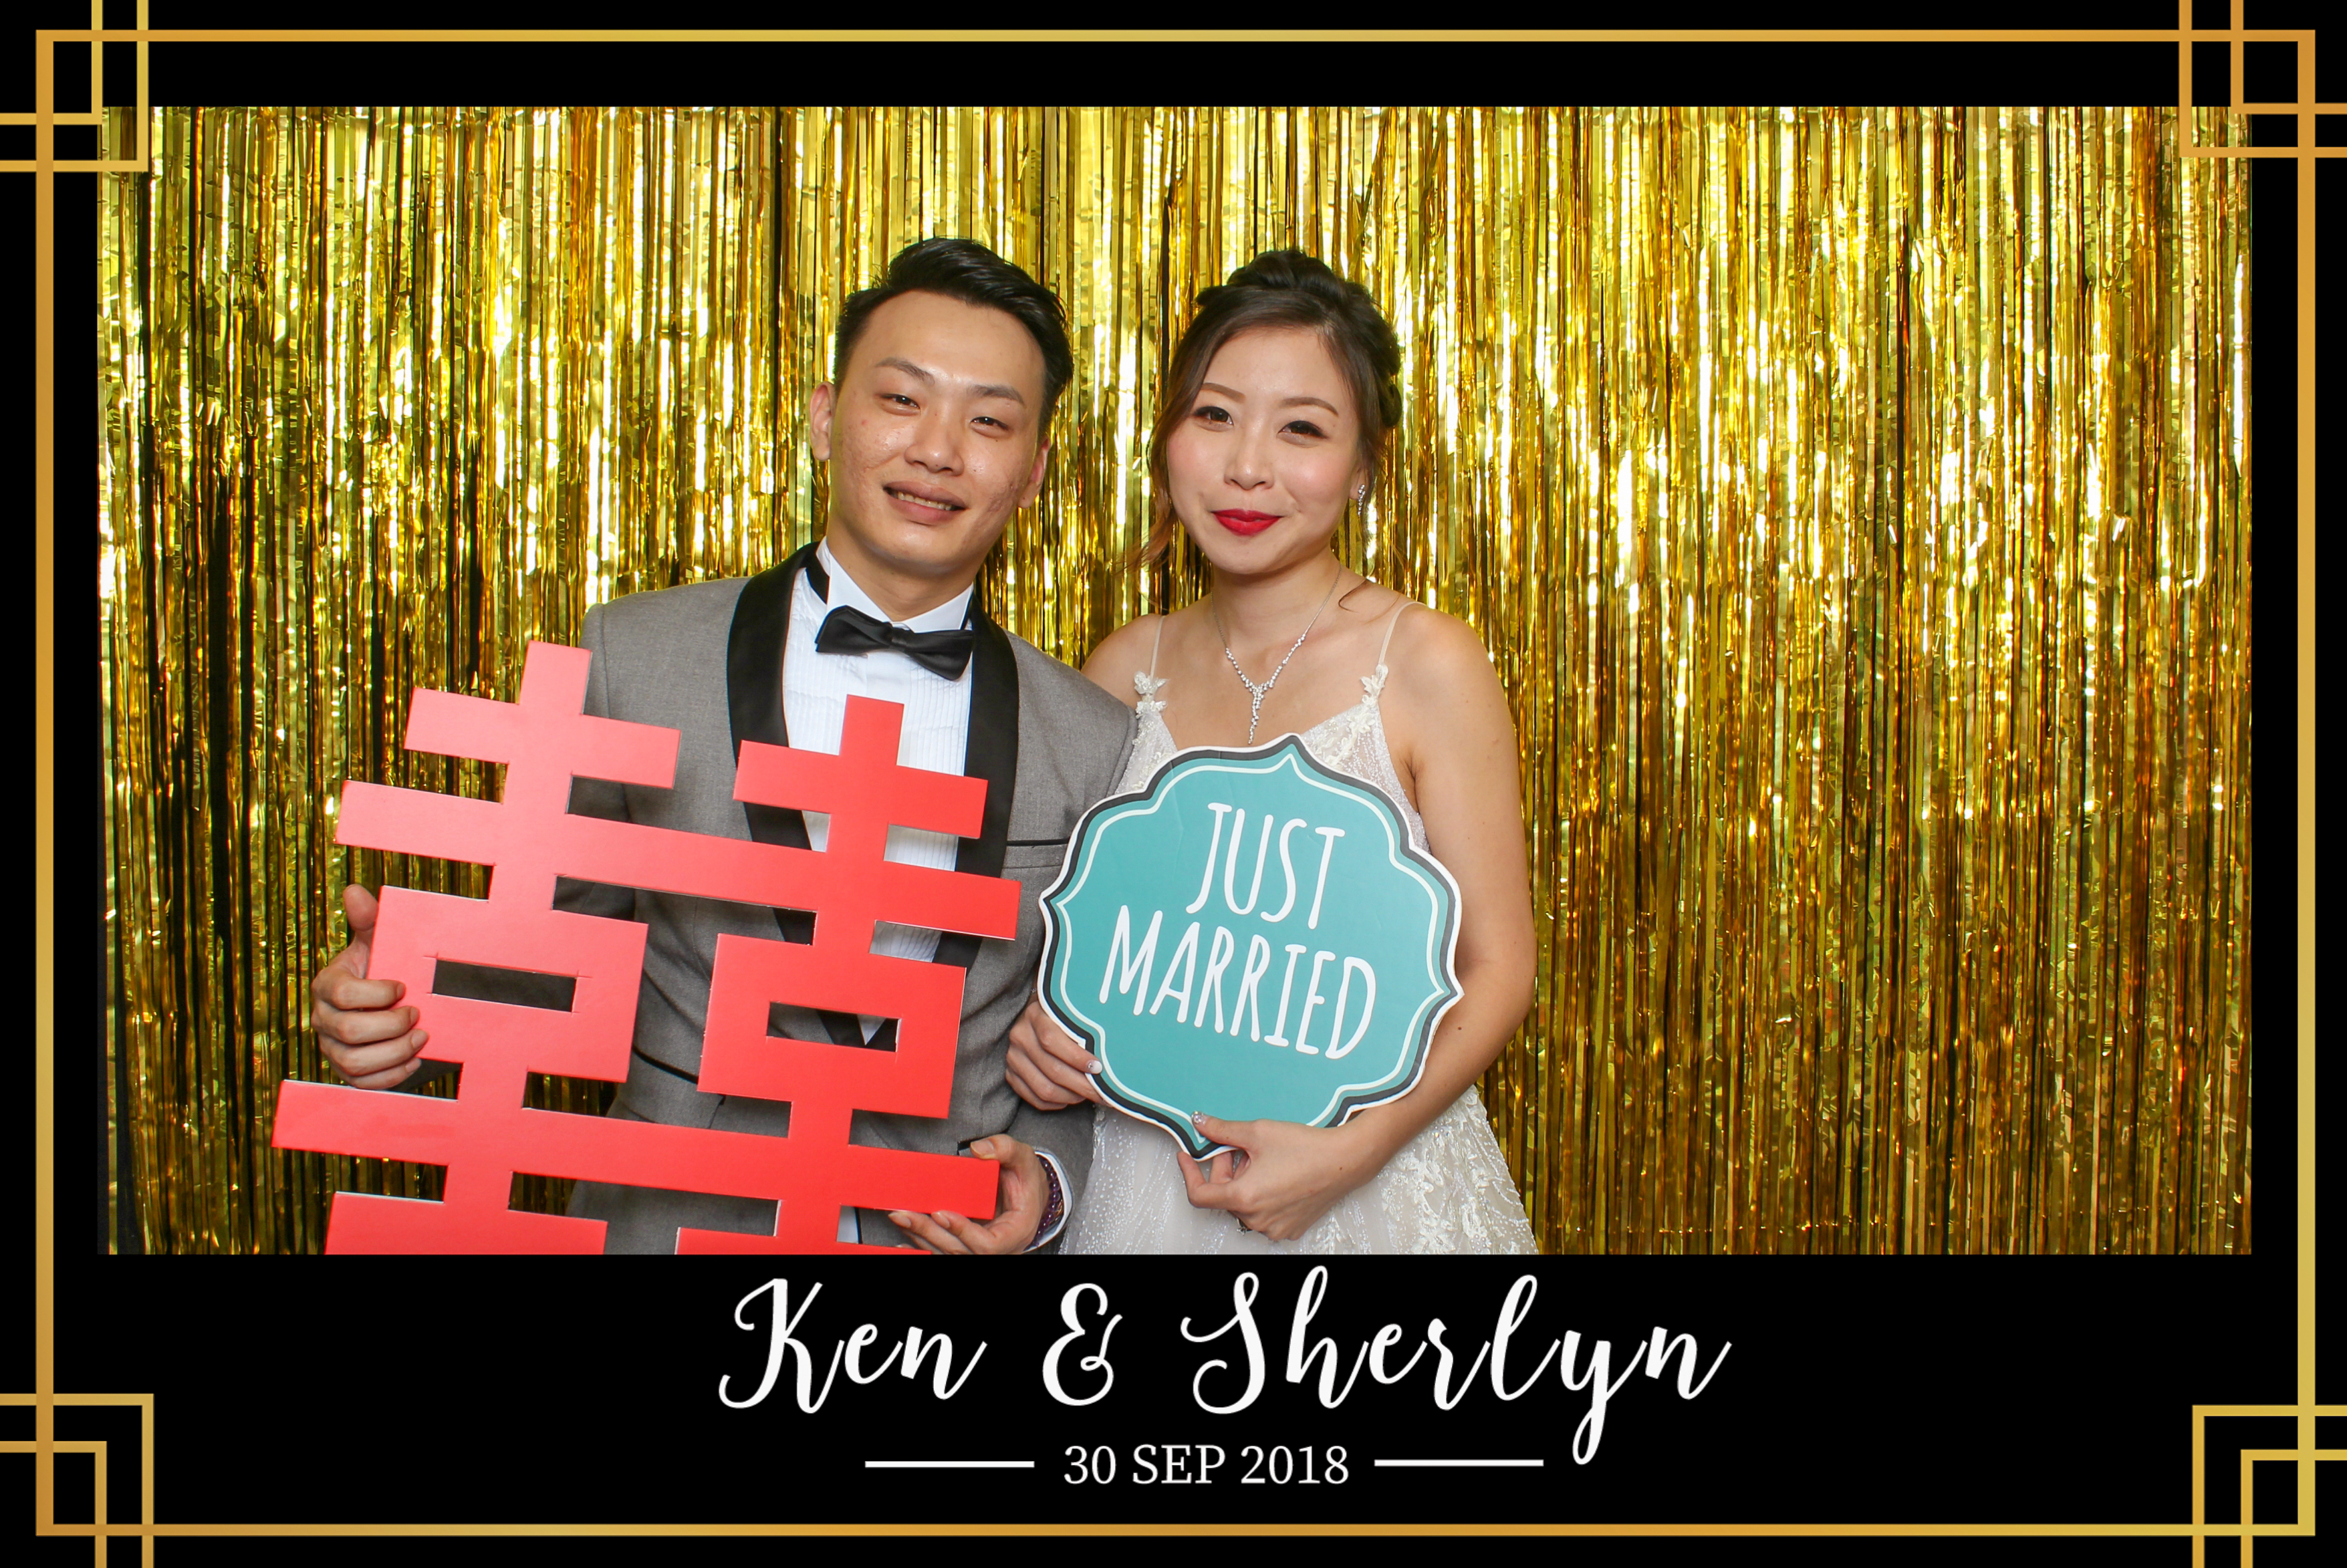 Ken Sherlyn wedding photo booth (50)